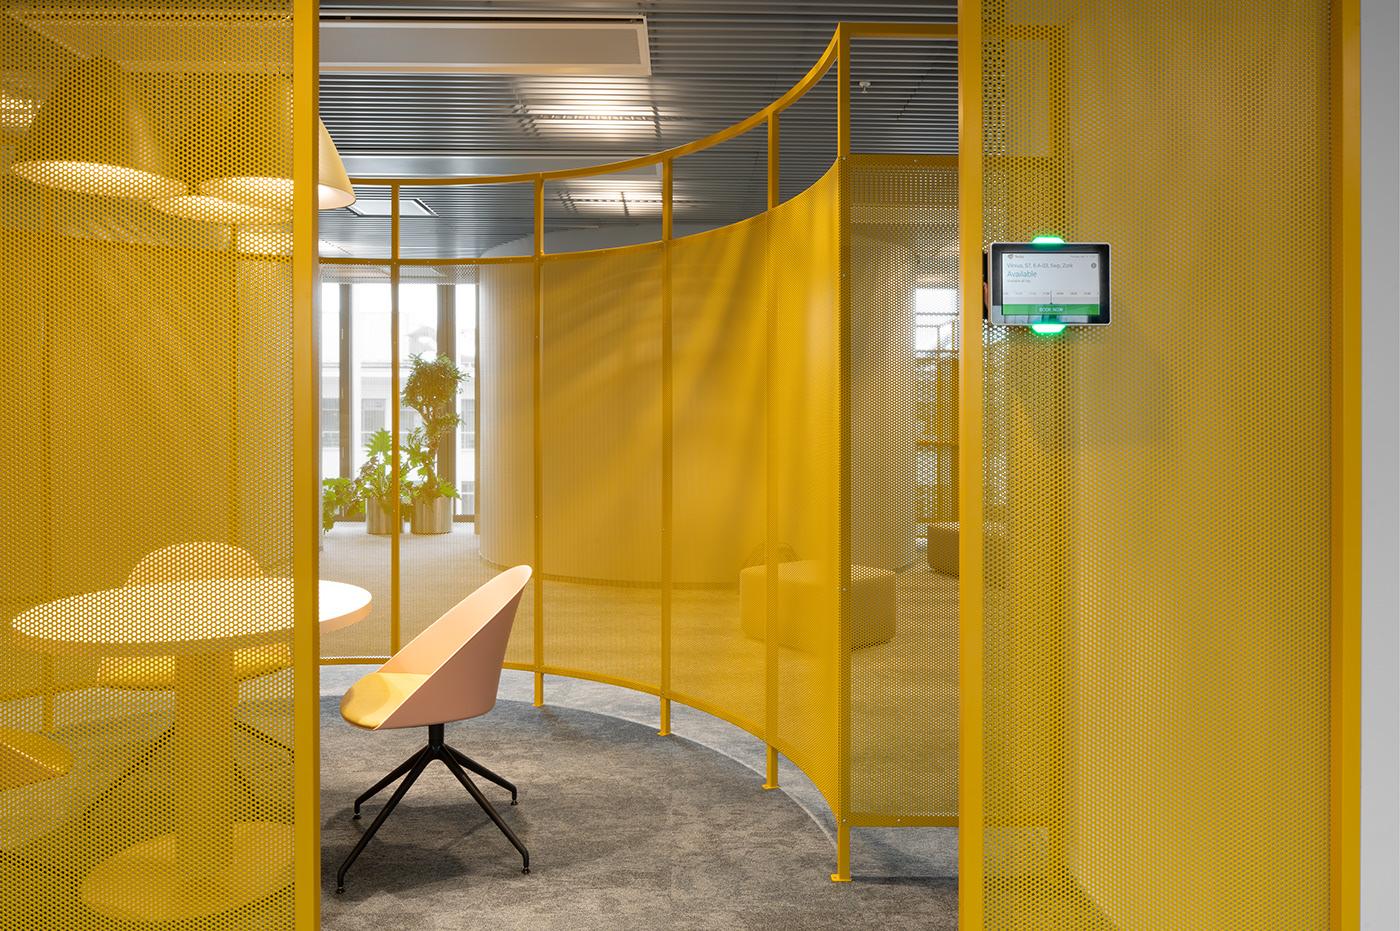 Office Interior architecture Interior Photography Architecture Photography Office Design office architecture workspace Office Space vilnius